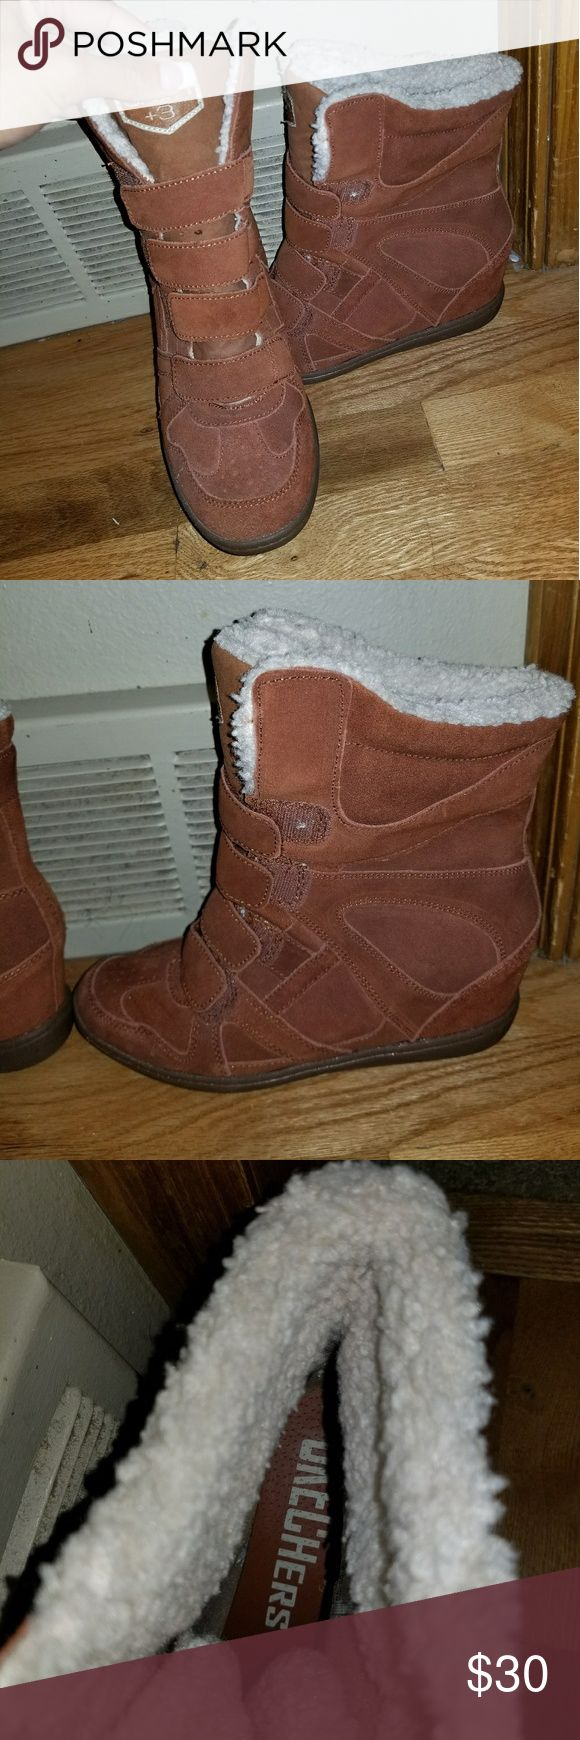 Skechers Wedge Sneaker Super cute, only worn once. Skechers Shoes Sneakers